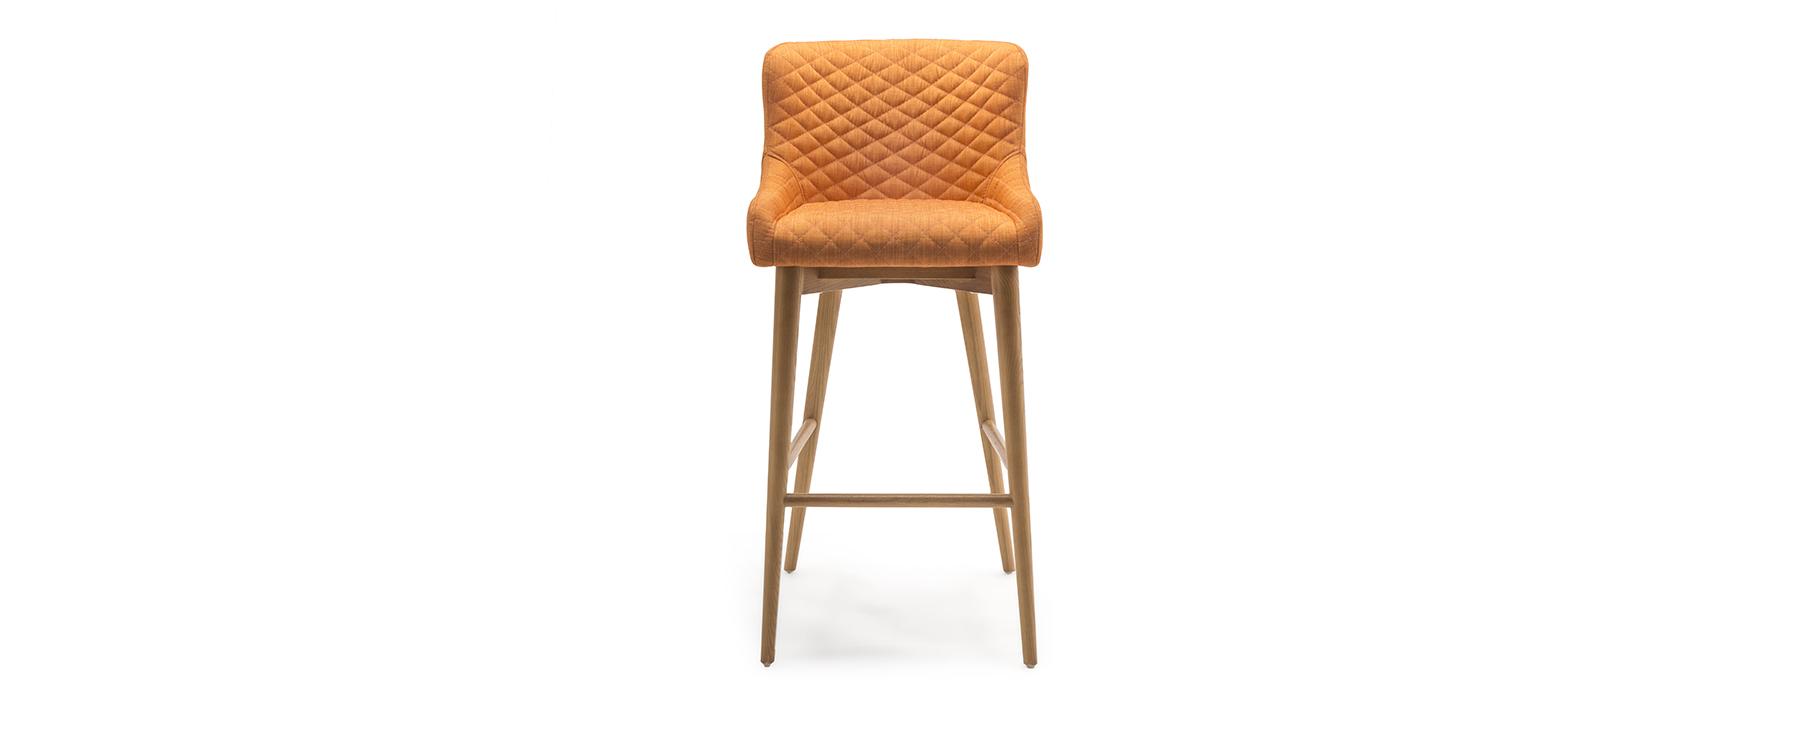 Chelsea bar stool in burnt orange ez living furniture dublin cork kildare waterford